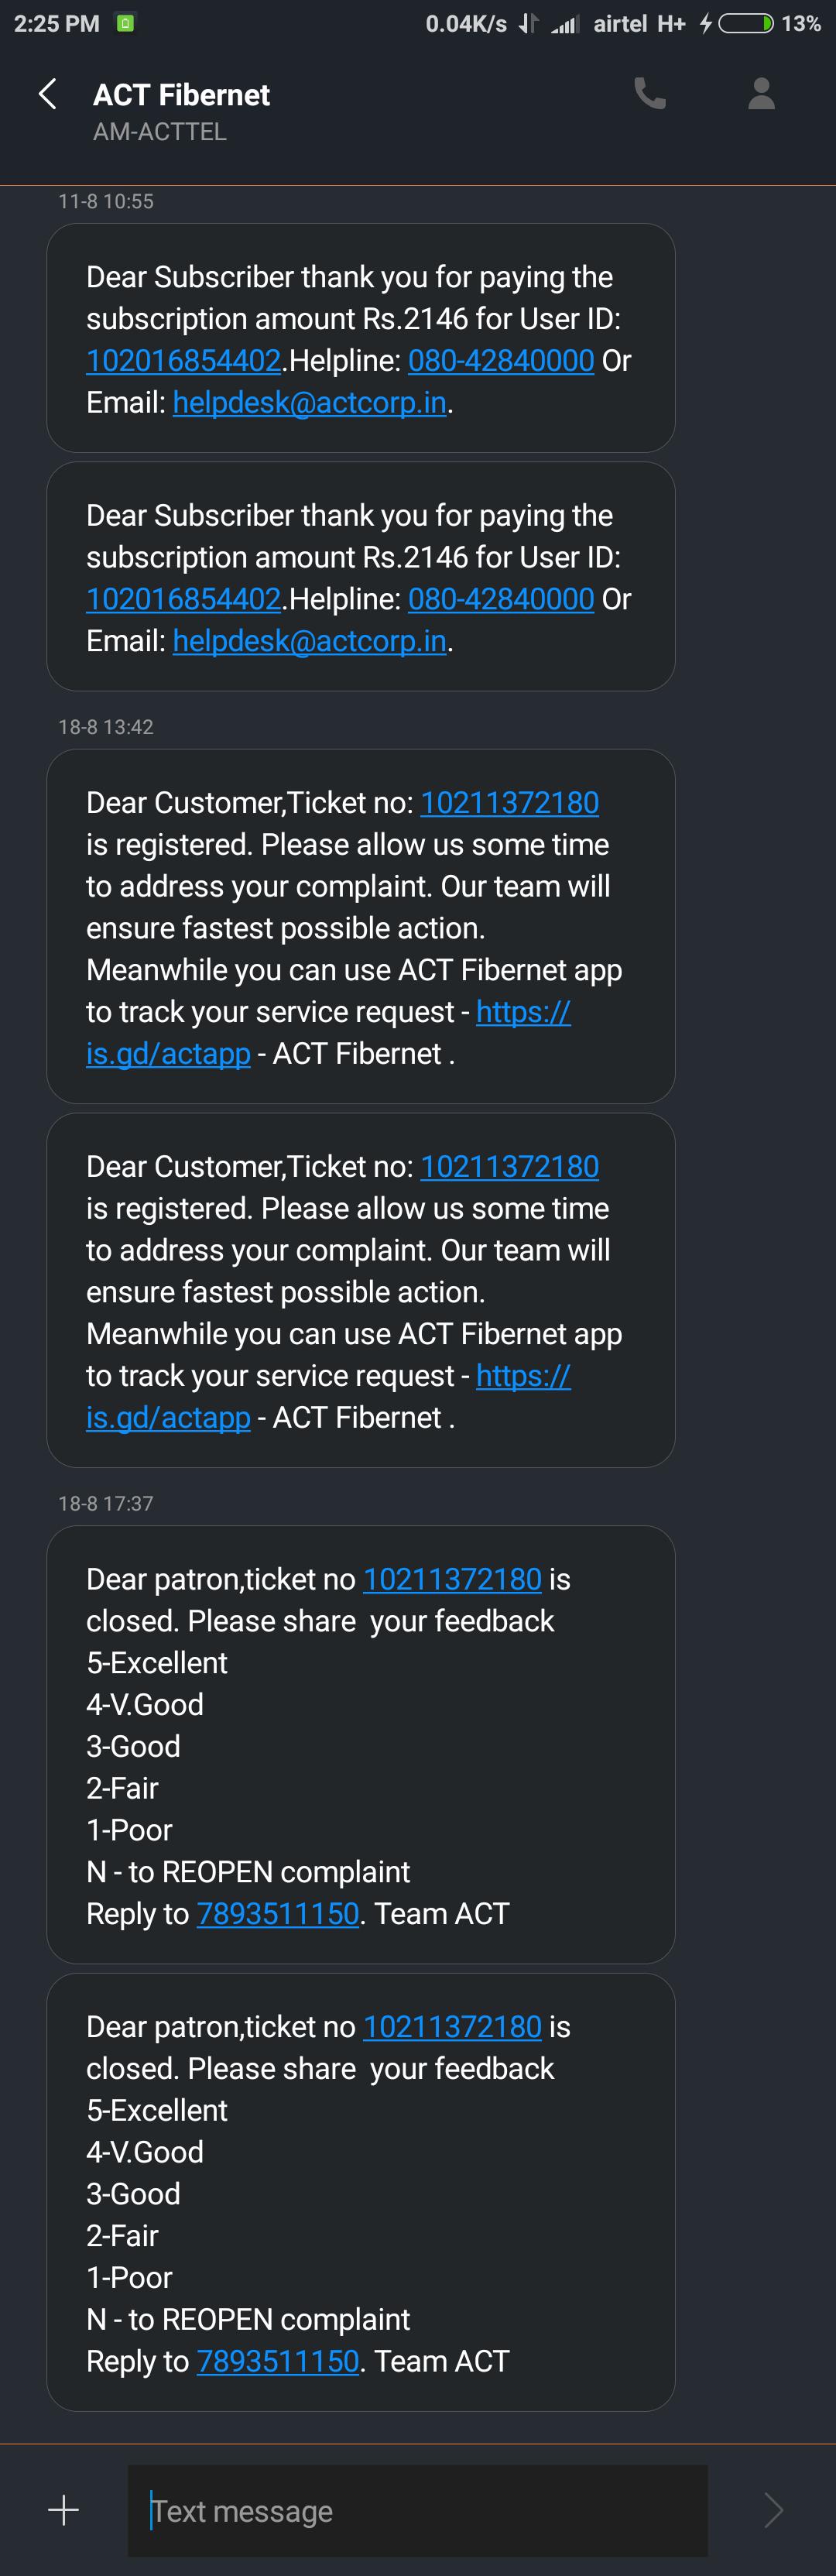 act fibernet customer care complaints and reviews